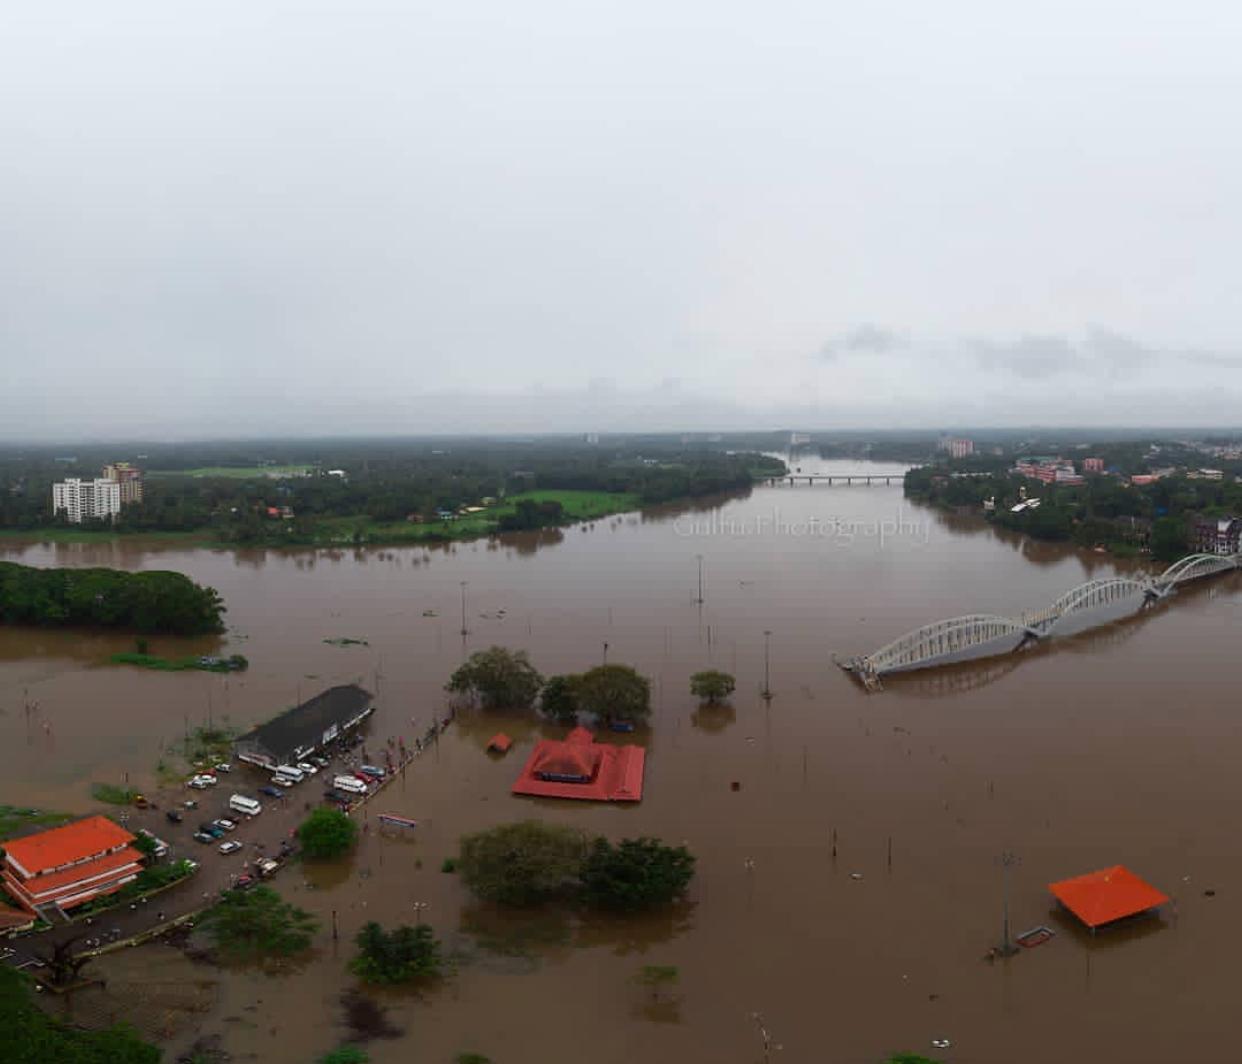 Kerala Monsoon Floods,River Periyar Floods Aluva Town and sivaTemple,aluva manapuram flood